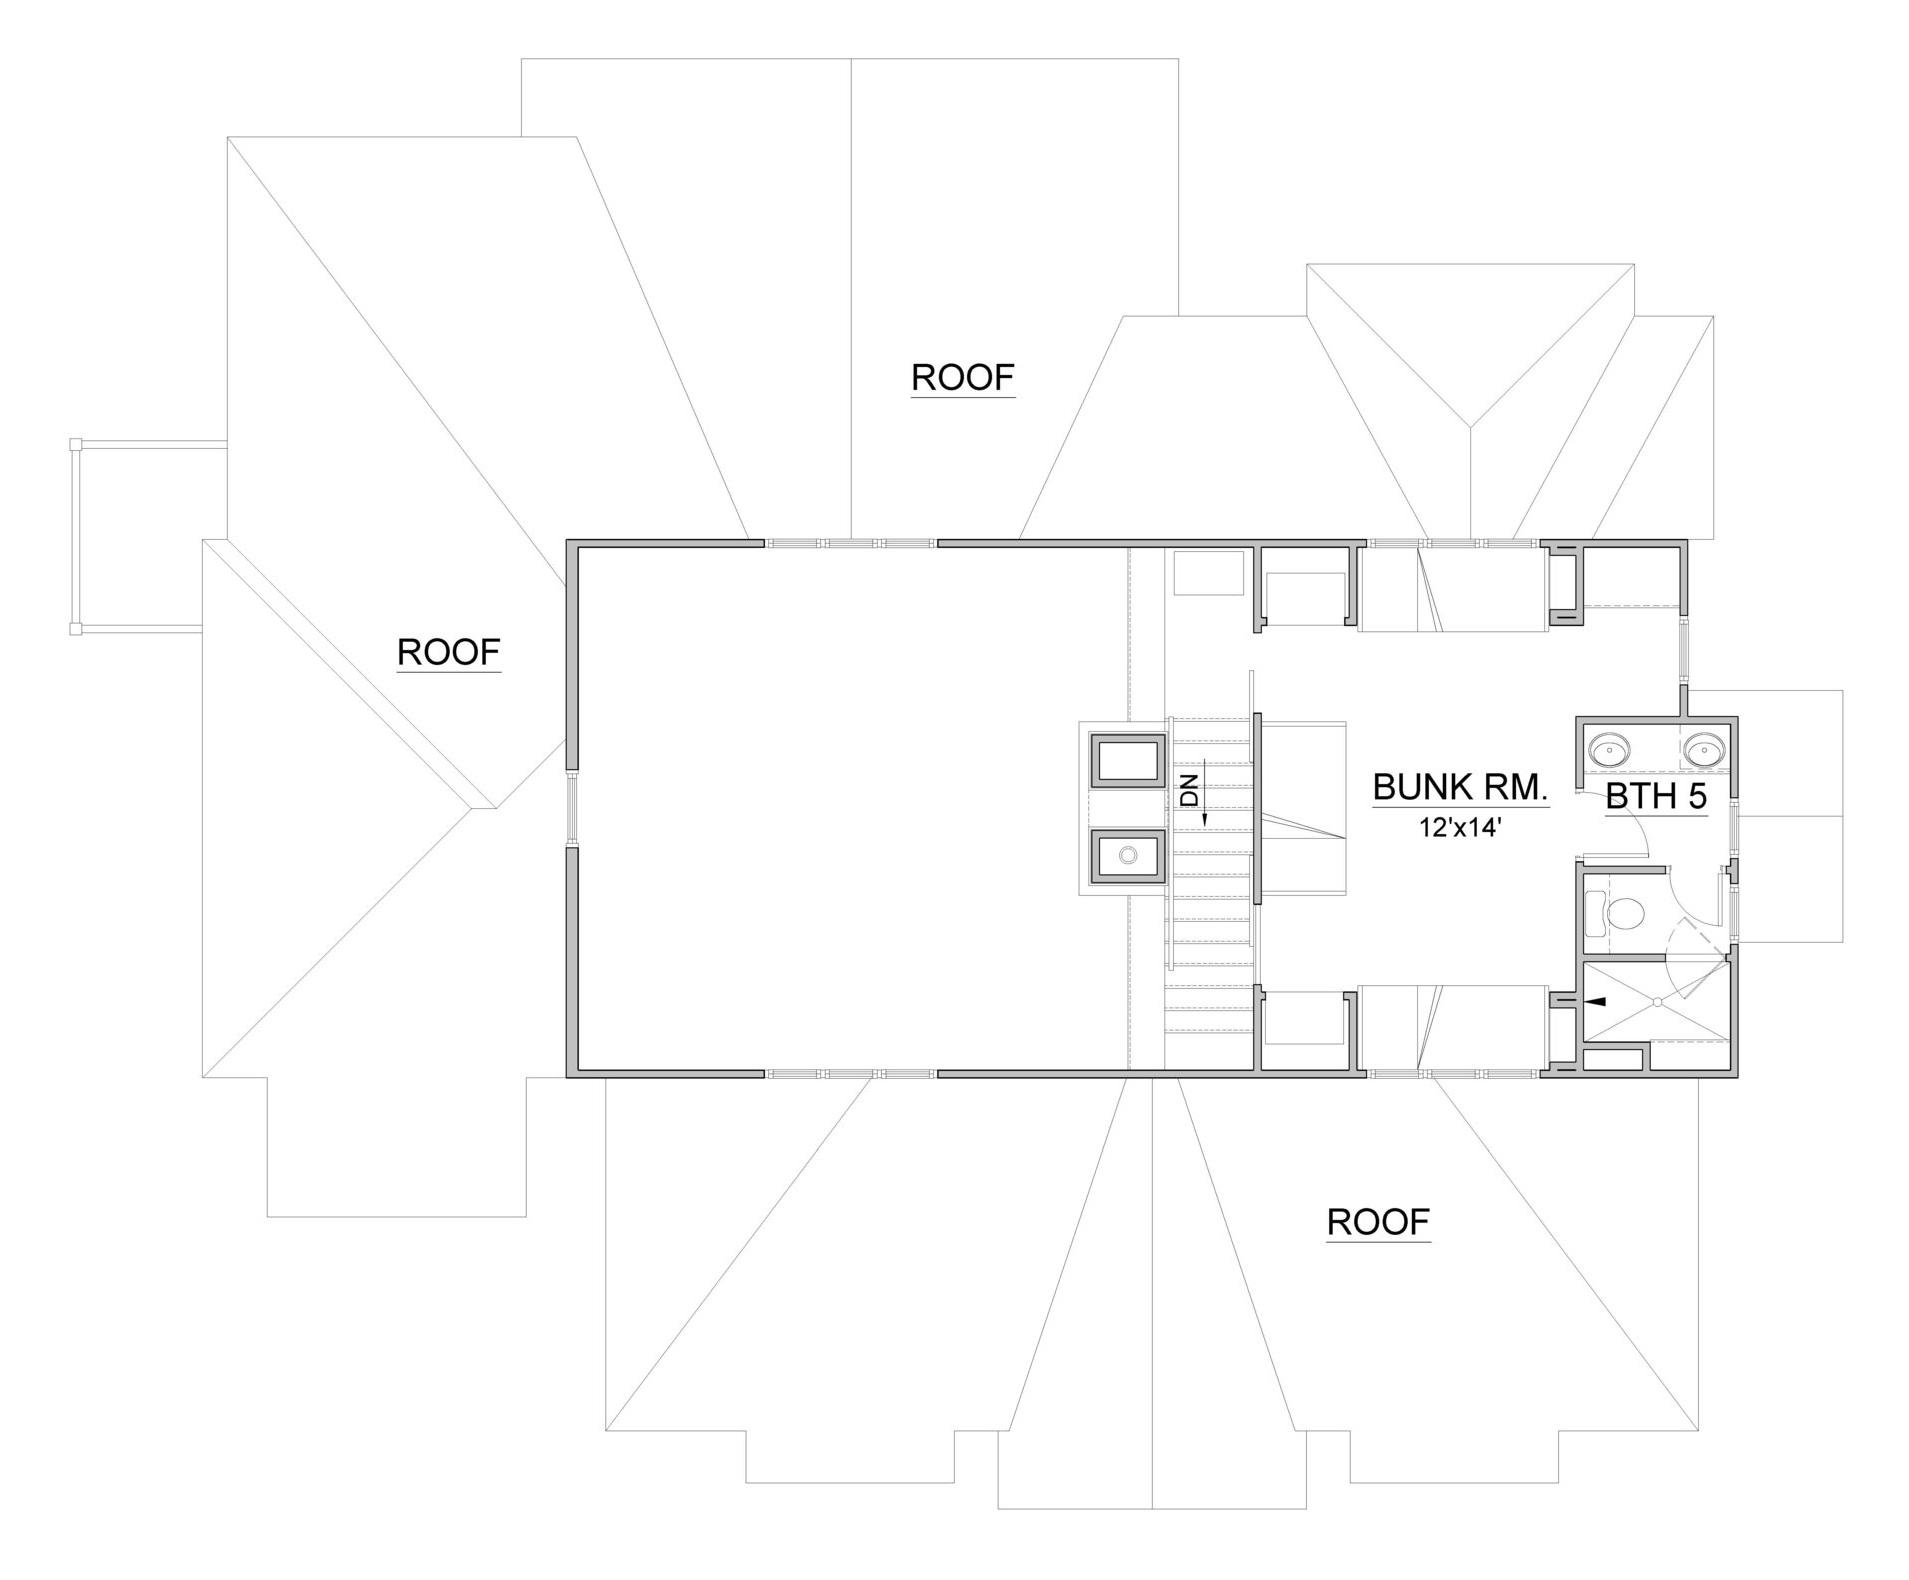 Sovine_Second Floor_24x36.jpg